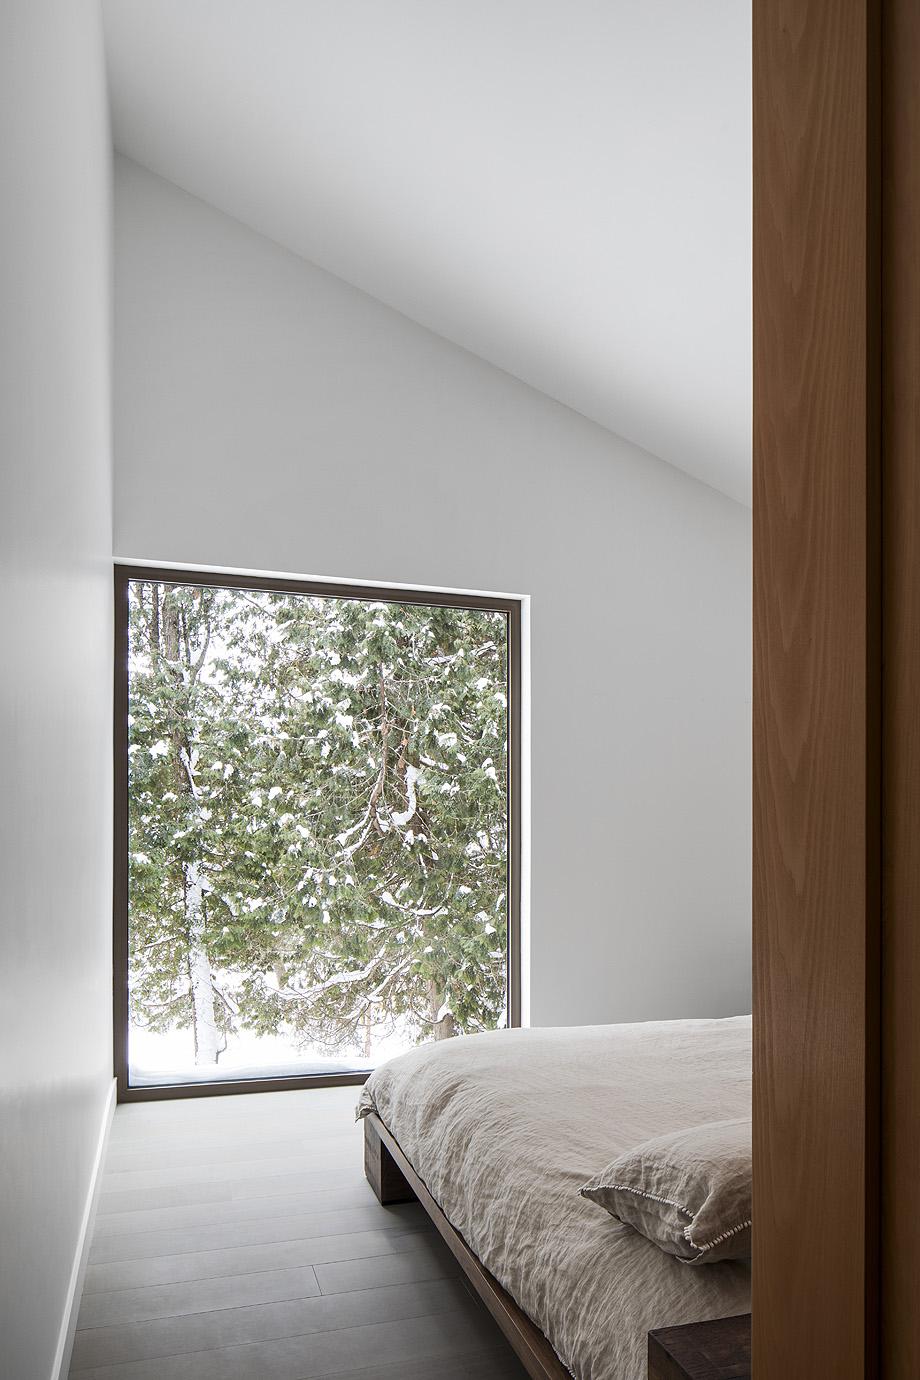 casa accostee de bourgeois lechasseur architects - foto adrien williams (7)